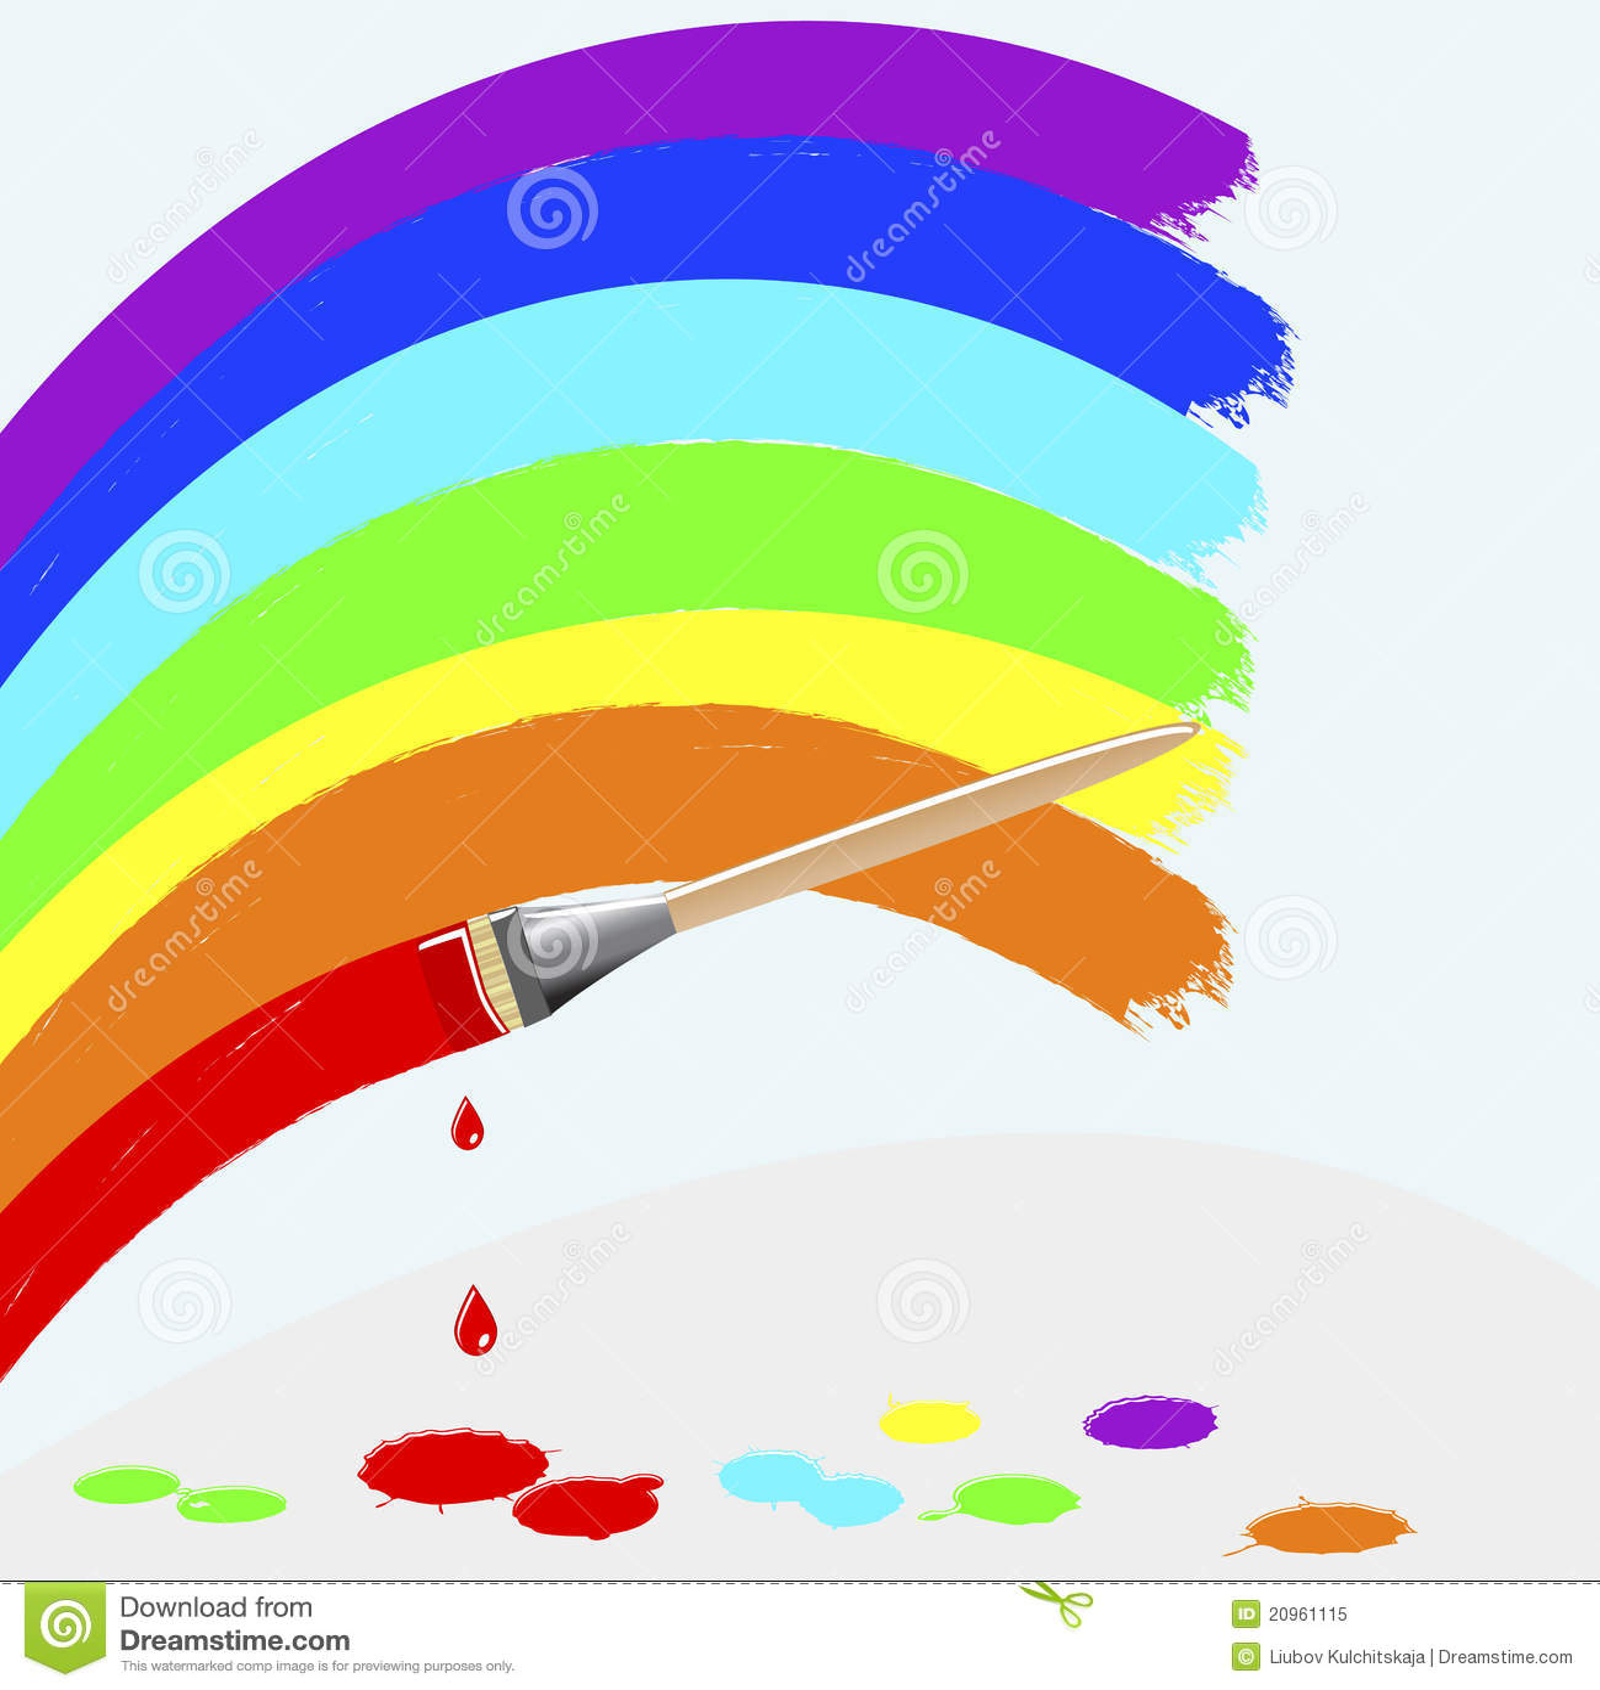 u5e93 u5b58 u6444 u5f71 uff1a  u4e0b u8f7d u81ea u7531 u7684 u5e93 u5b58 u7167 u7247  u7687 u65cf u91ca u653e u56fe u8c61 vector rainbow six siege vector rainbow creative commons